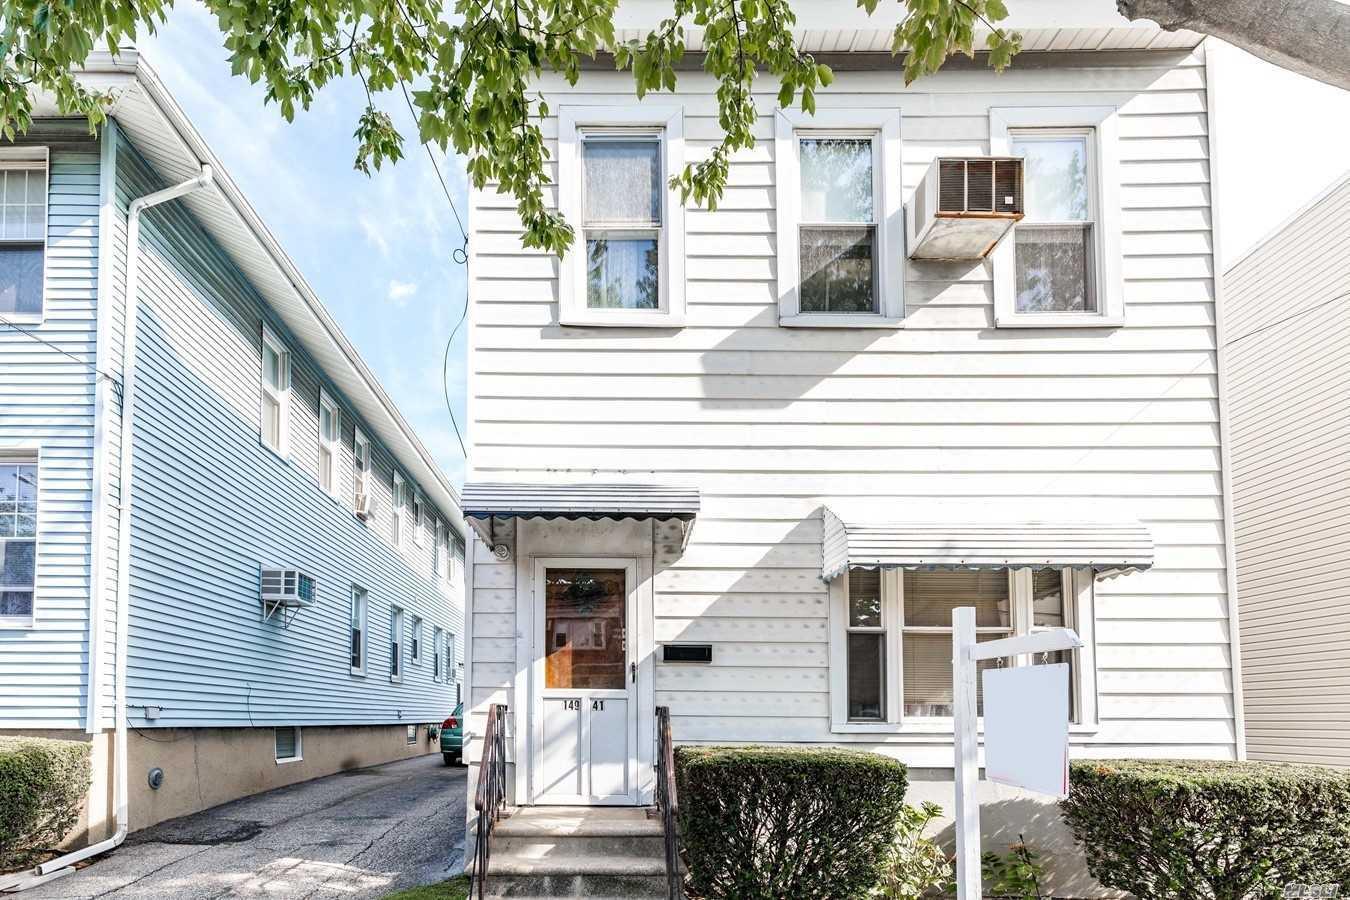 Property for sale at 149-41 15th Road, Whitestone NY 11357, Whitestone,  New York 11357